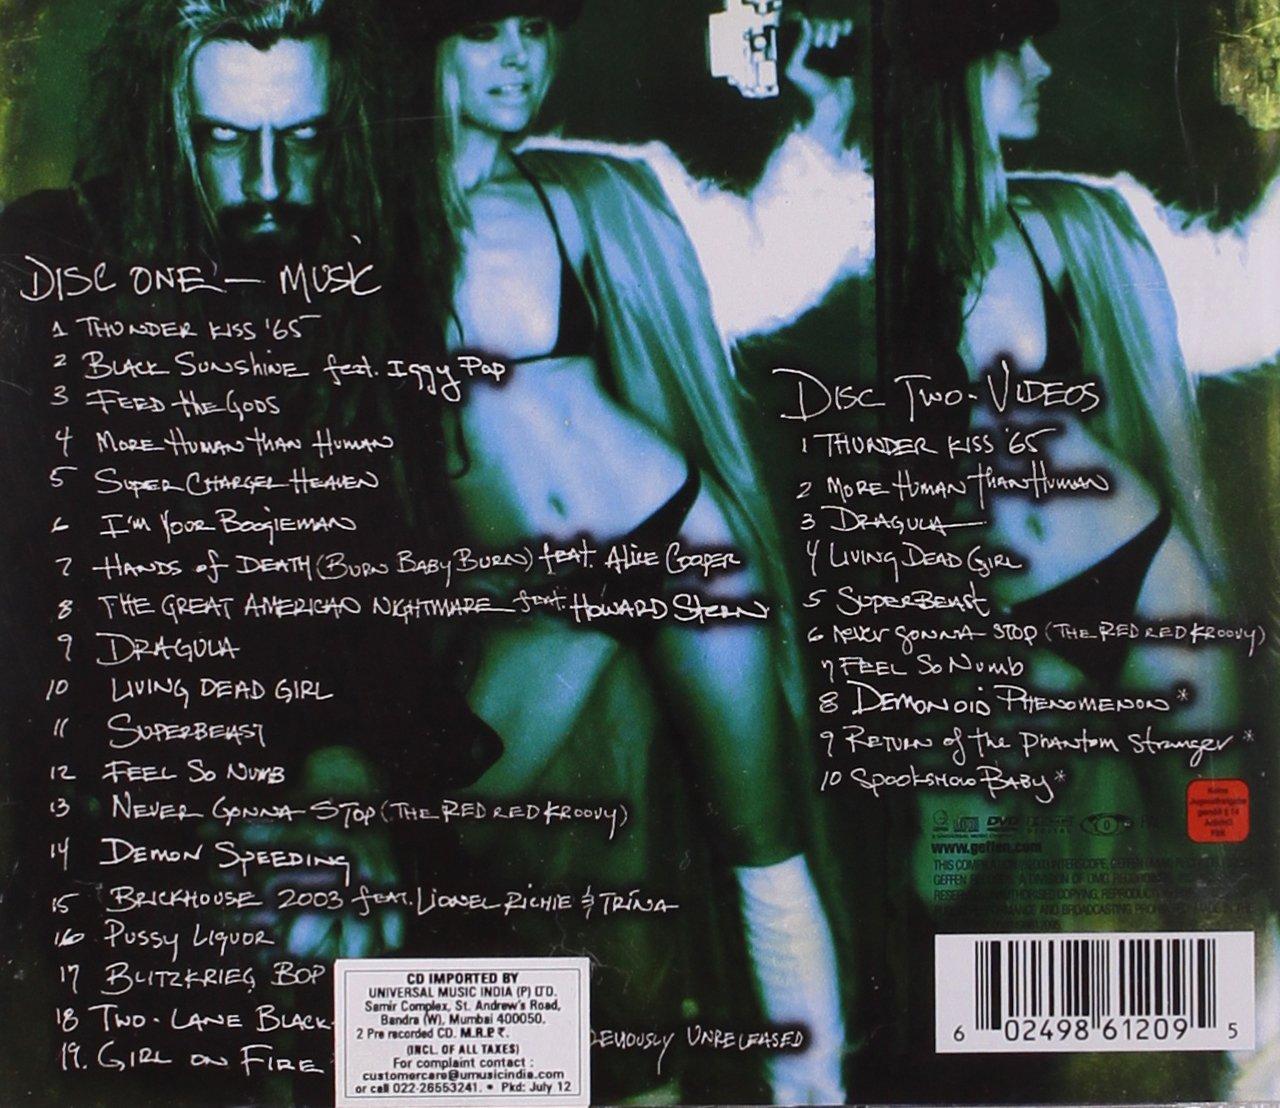 Greatest Hits: Past Present & Future